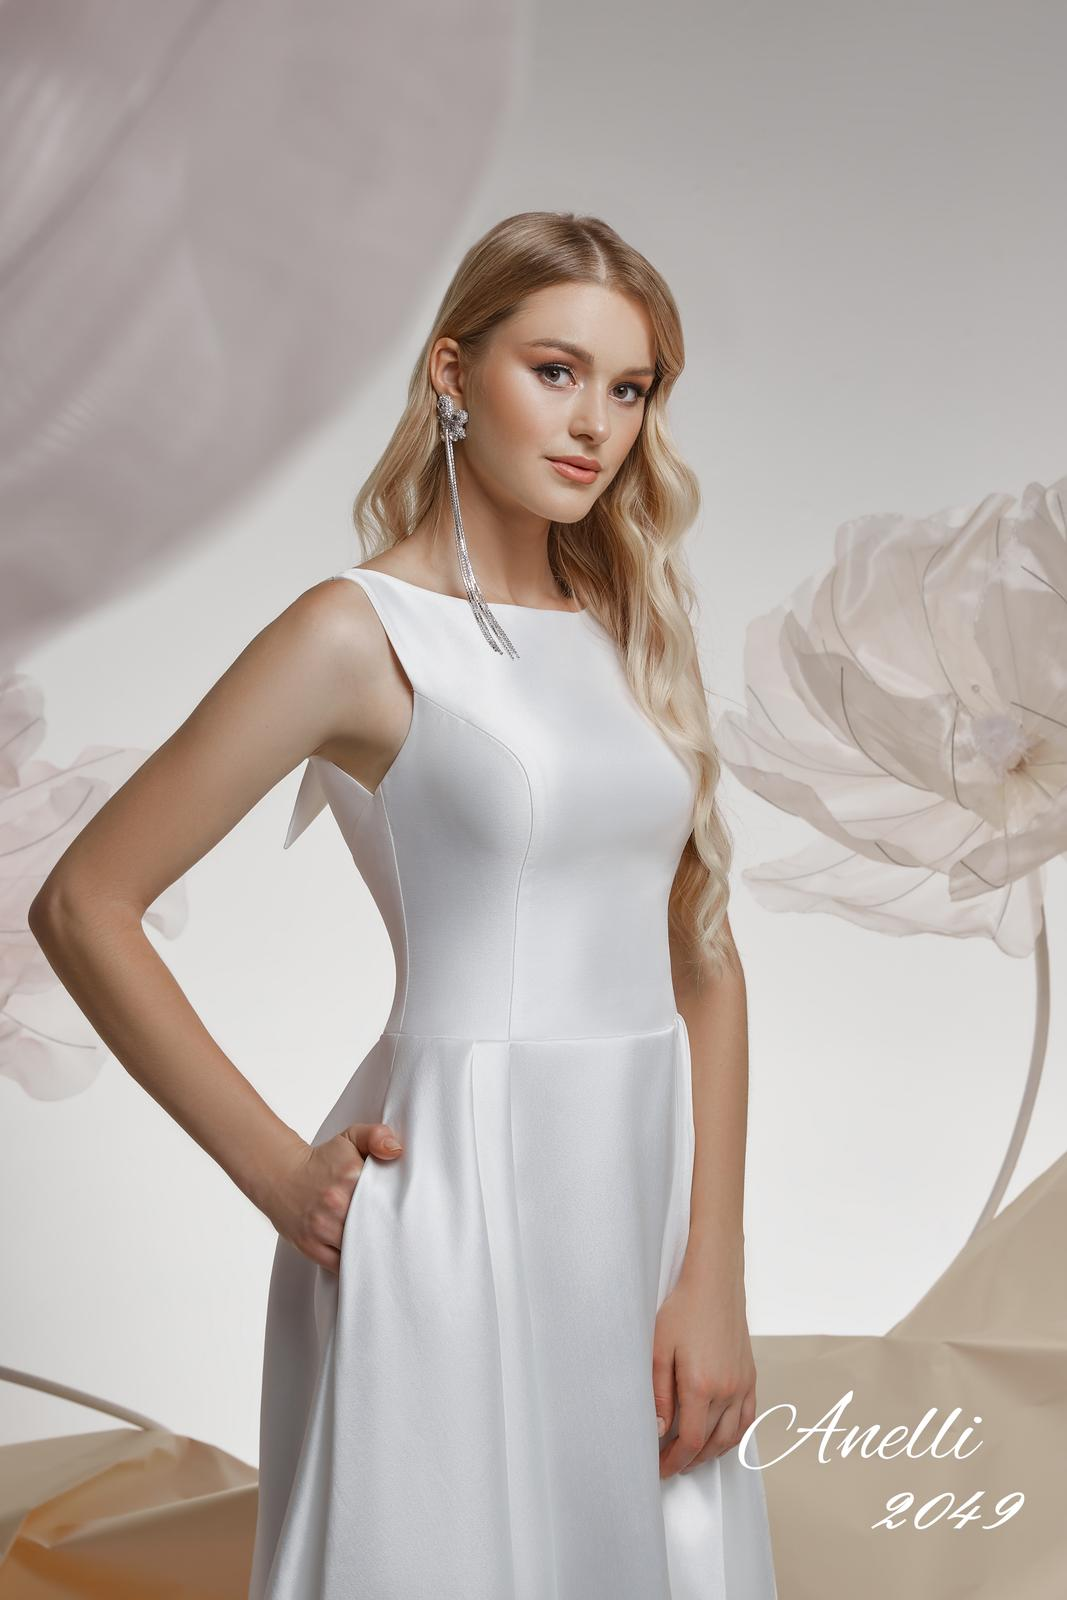 Svadobné šaty - Imagine 2049 - Obrázok č. 3